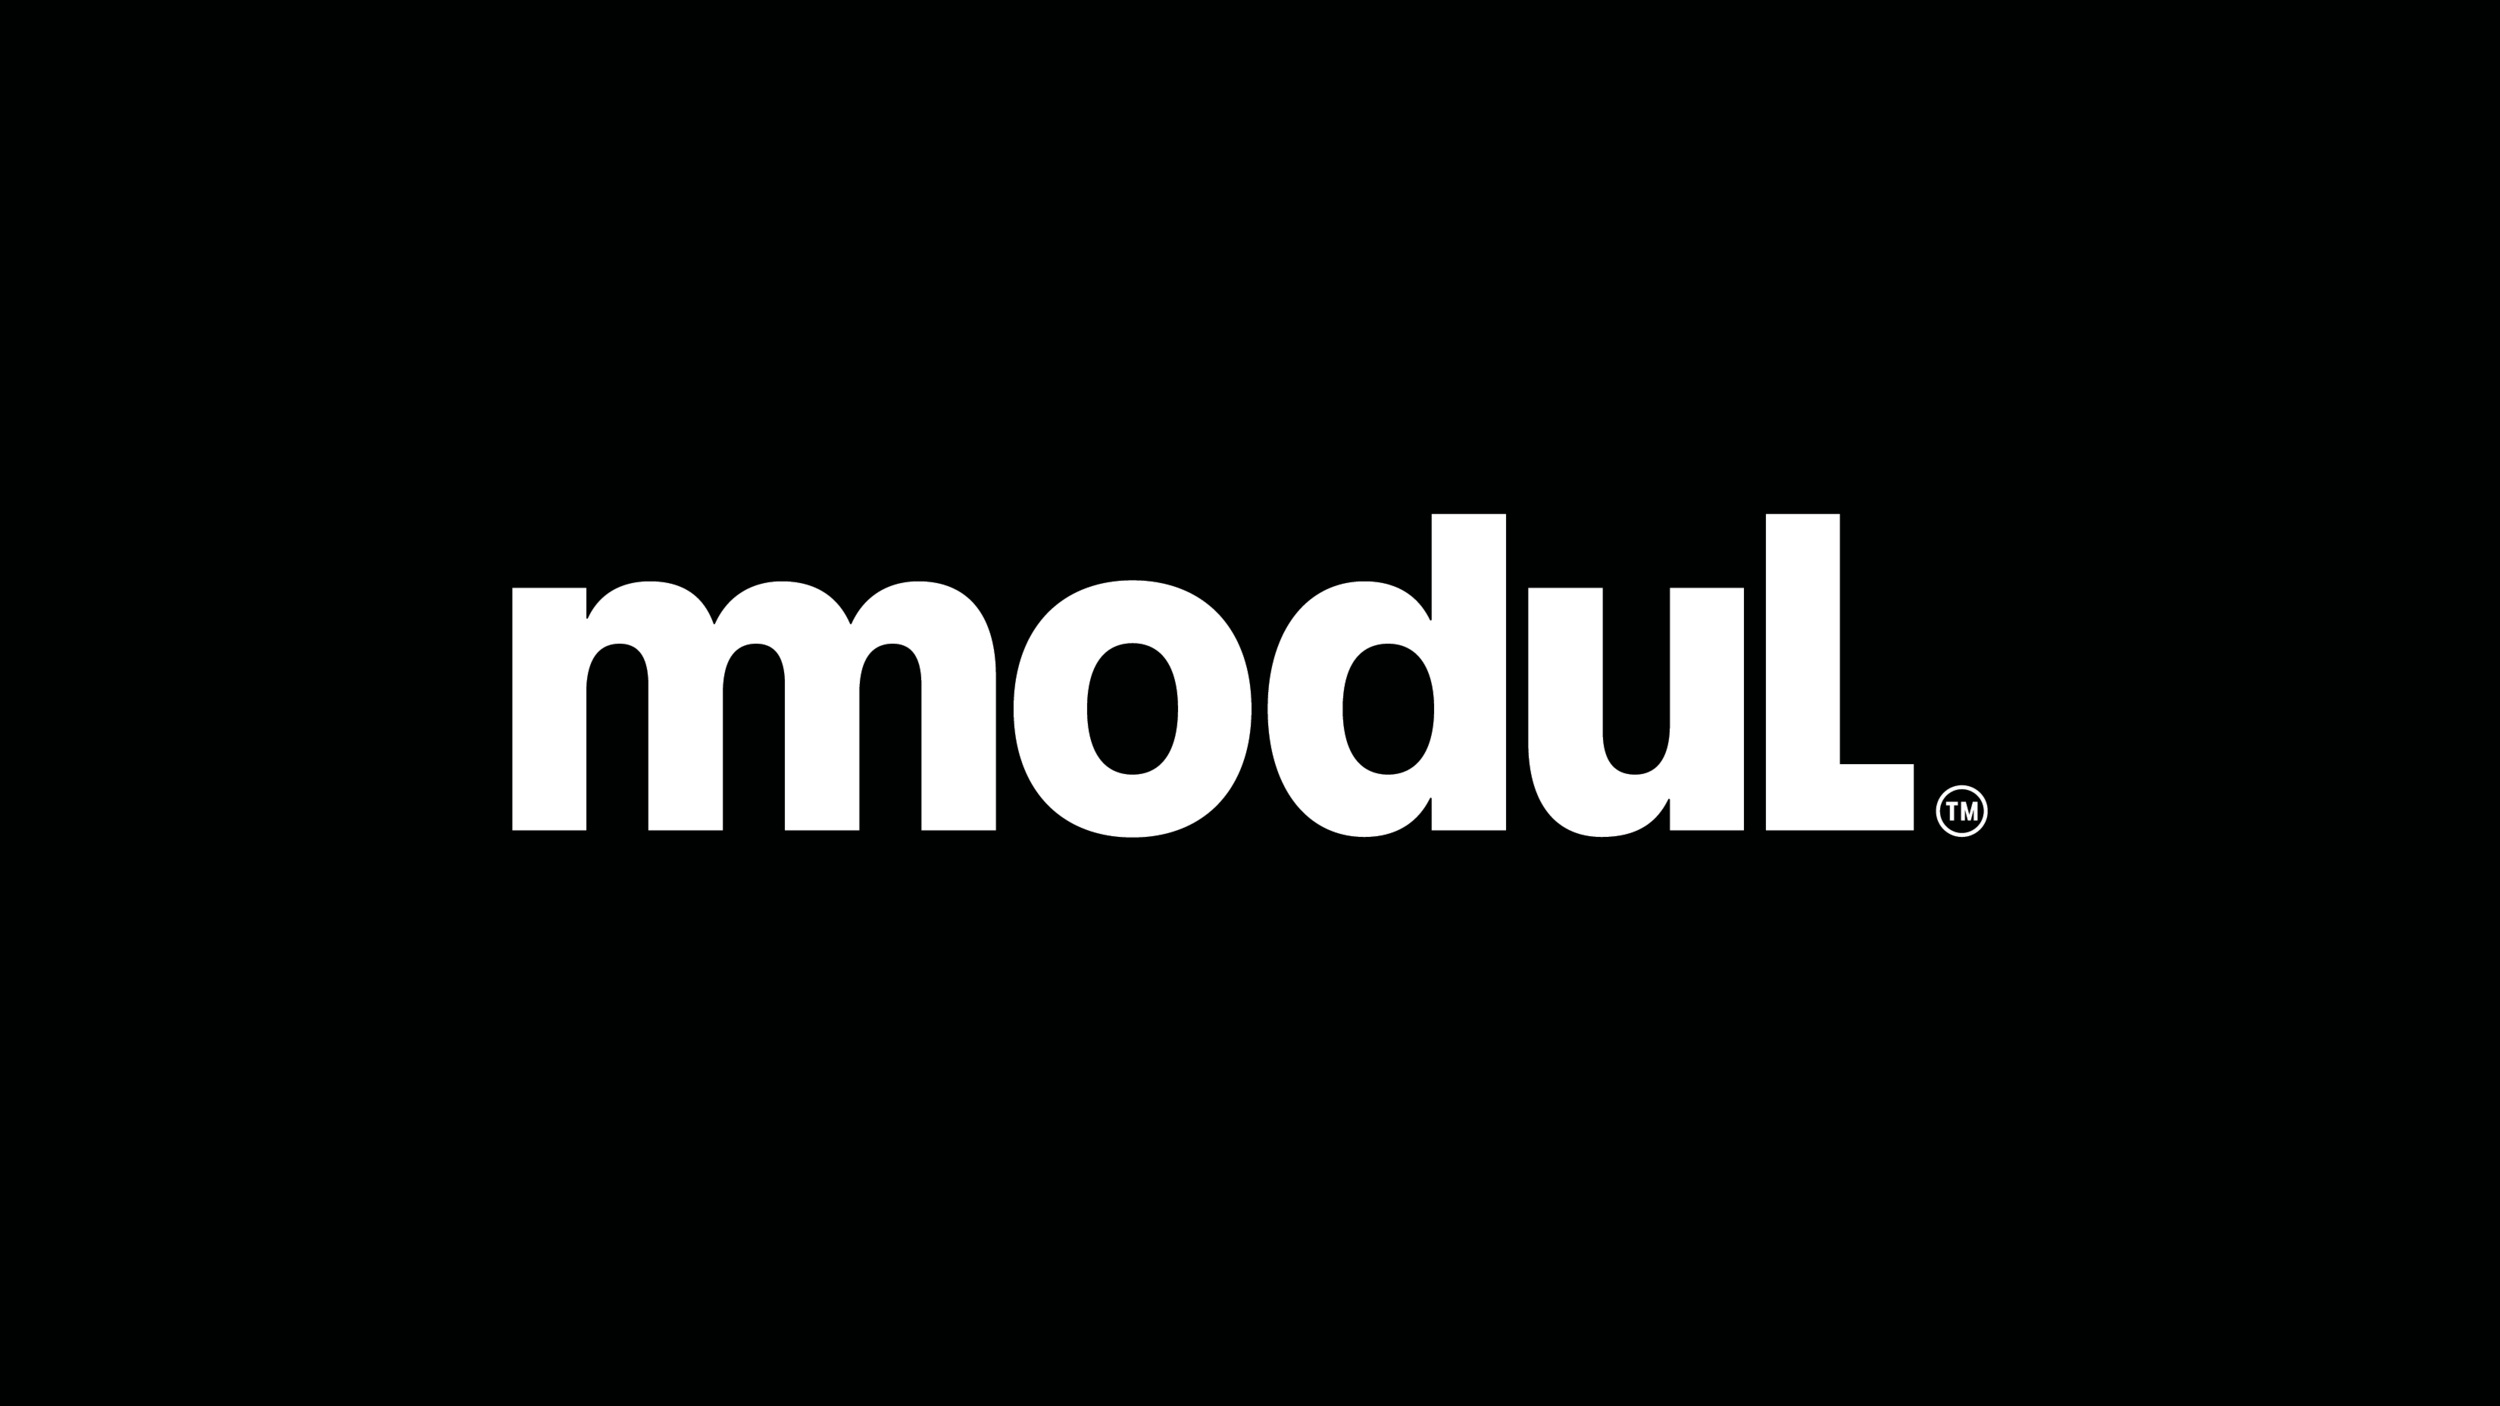 modul_logo_final-01.jpg